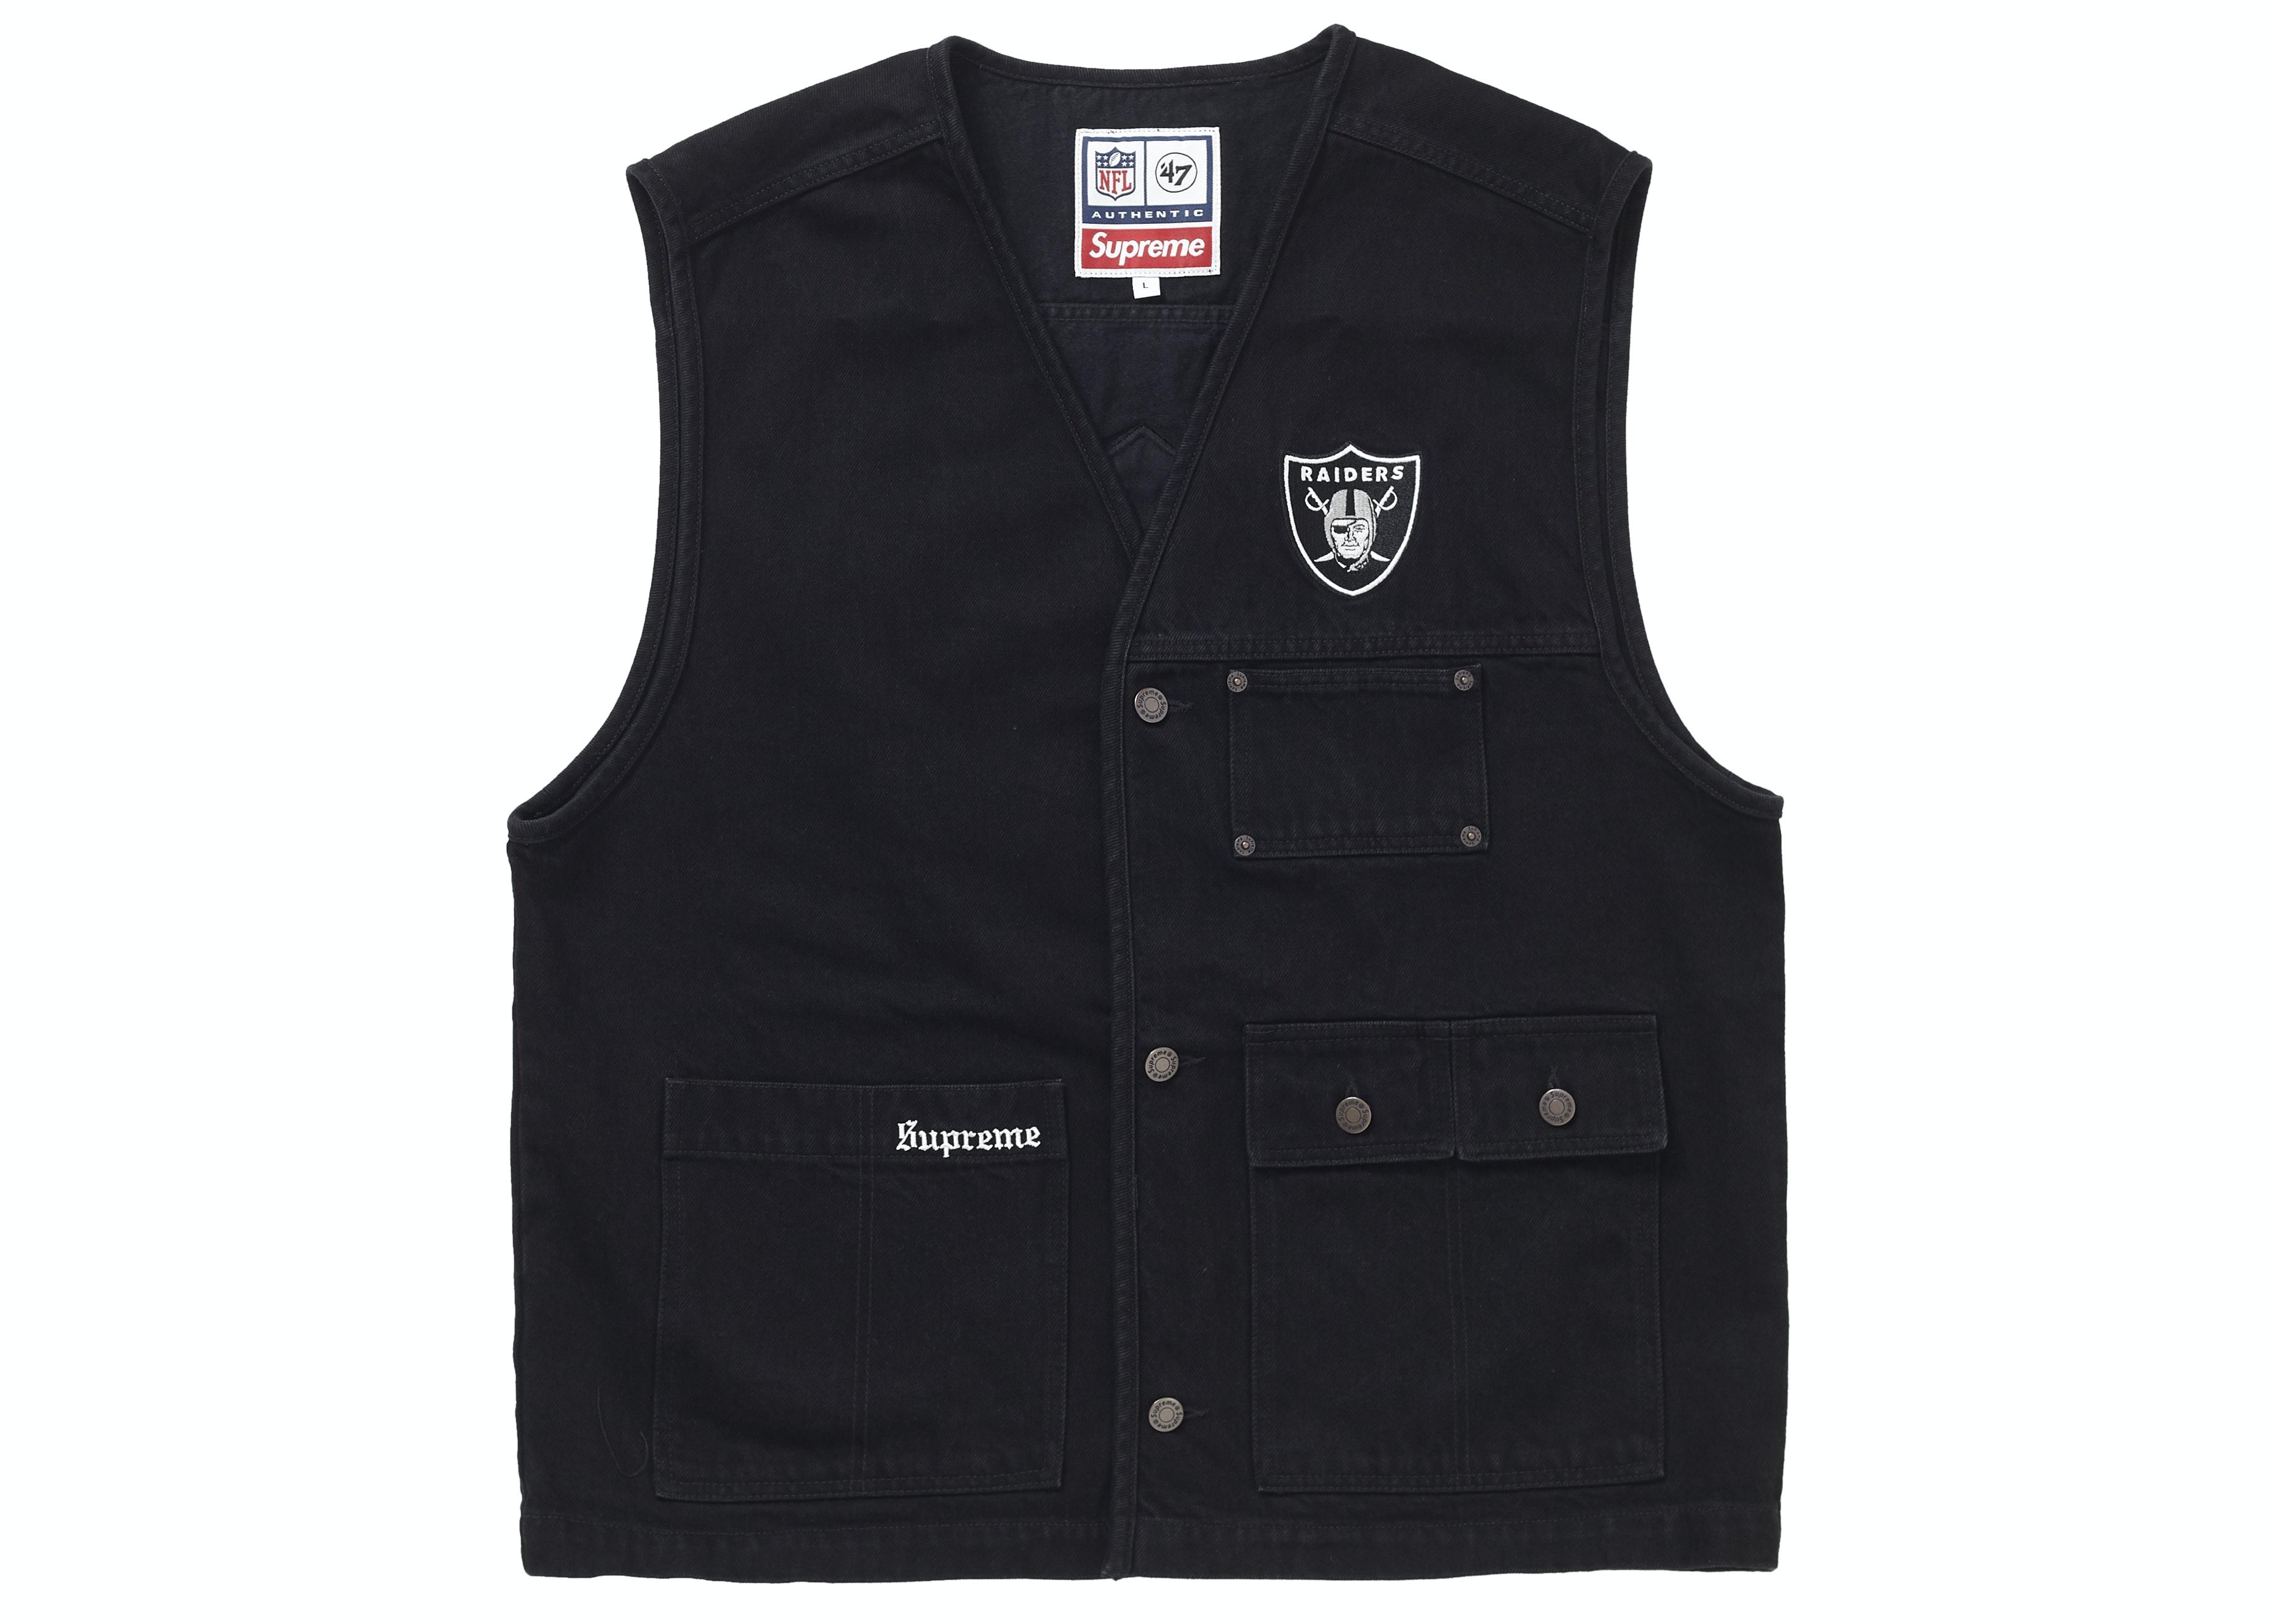 Supreme NFL x Raiders x '47 Denim Vest Black